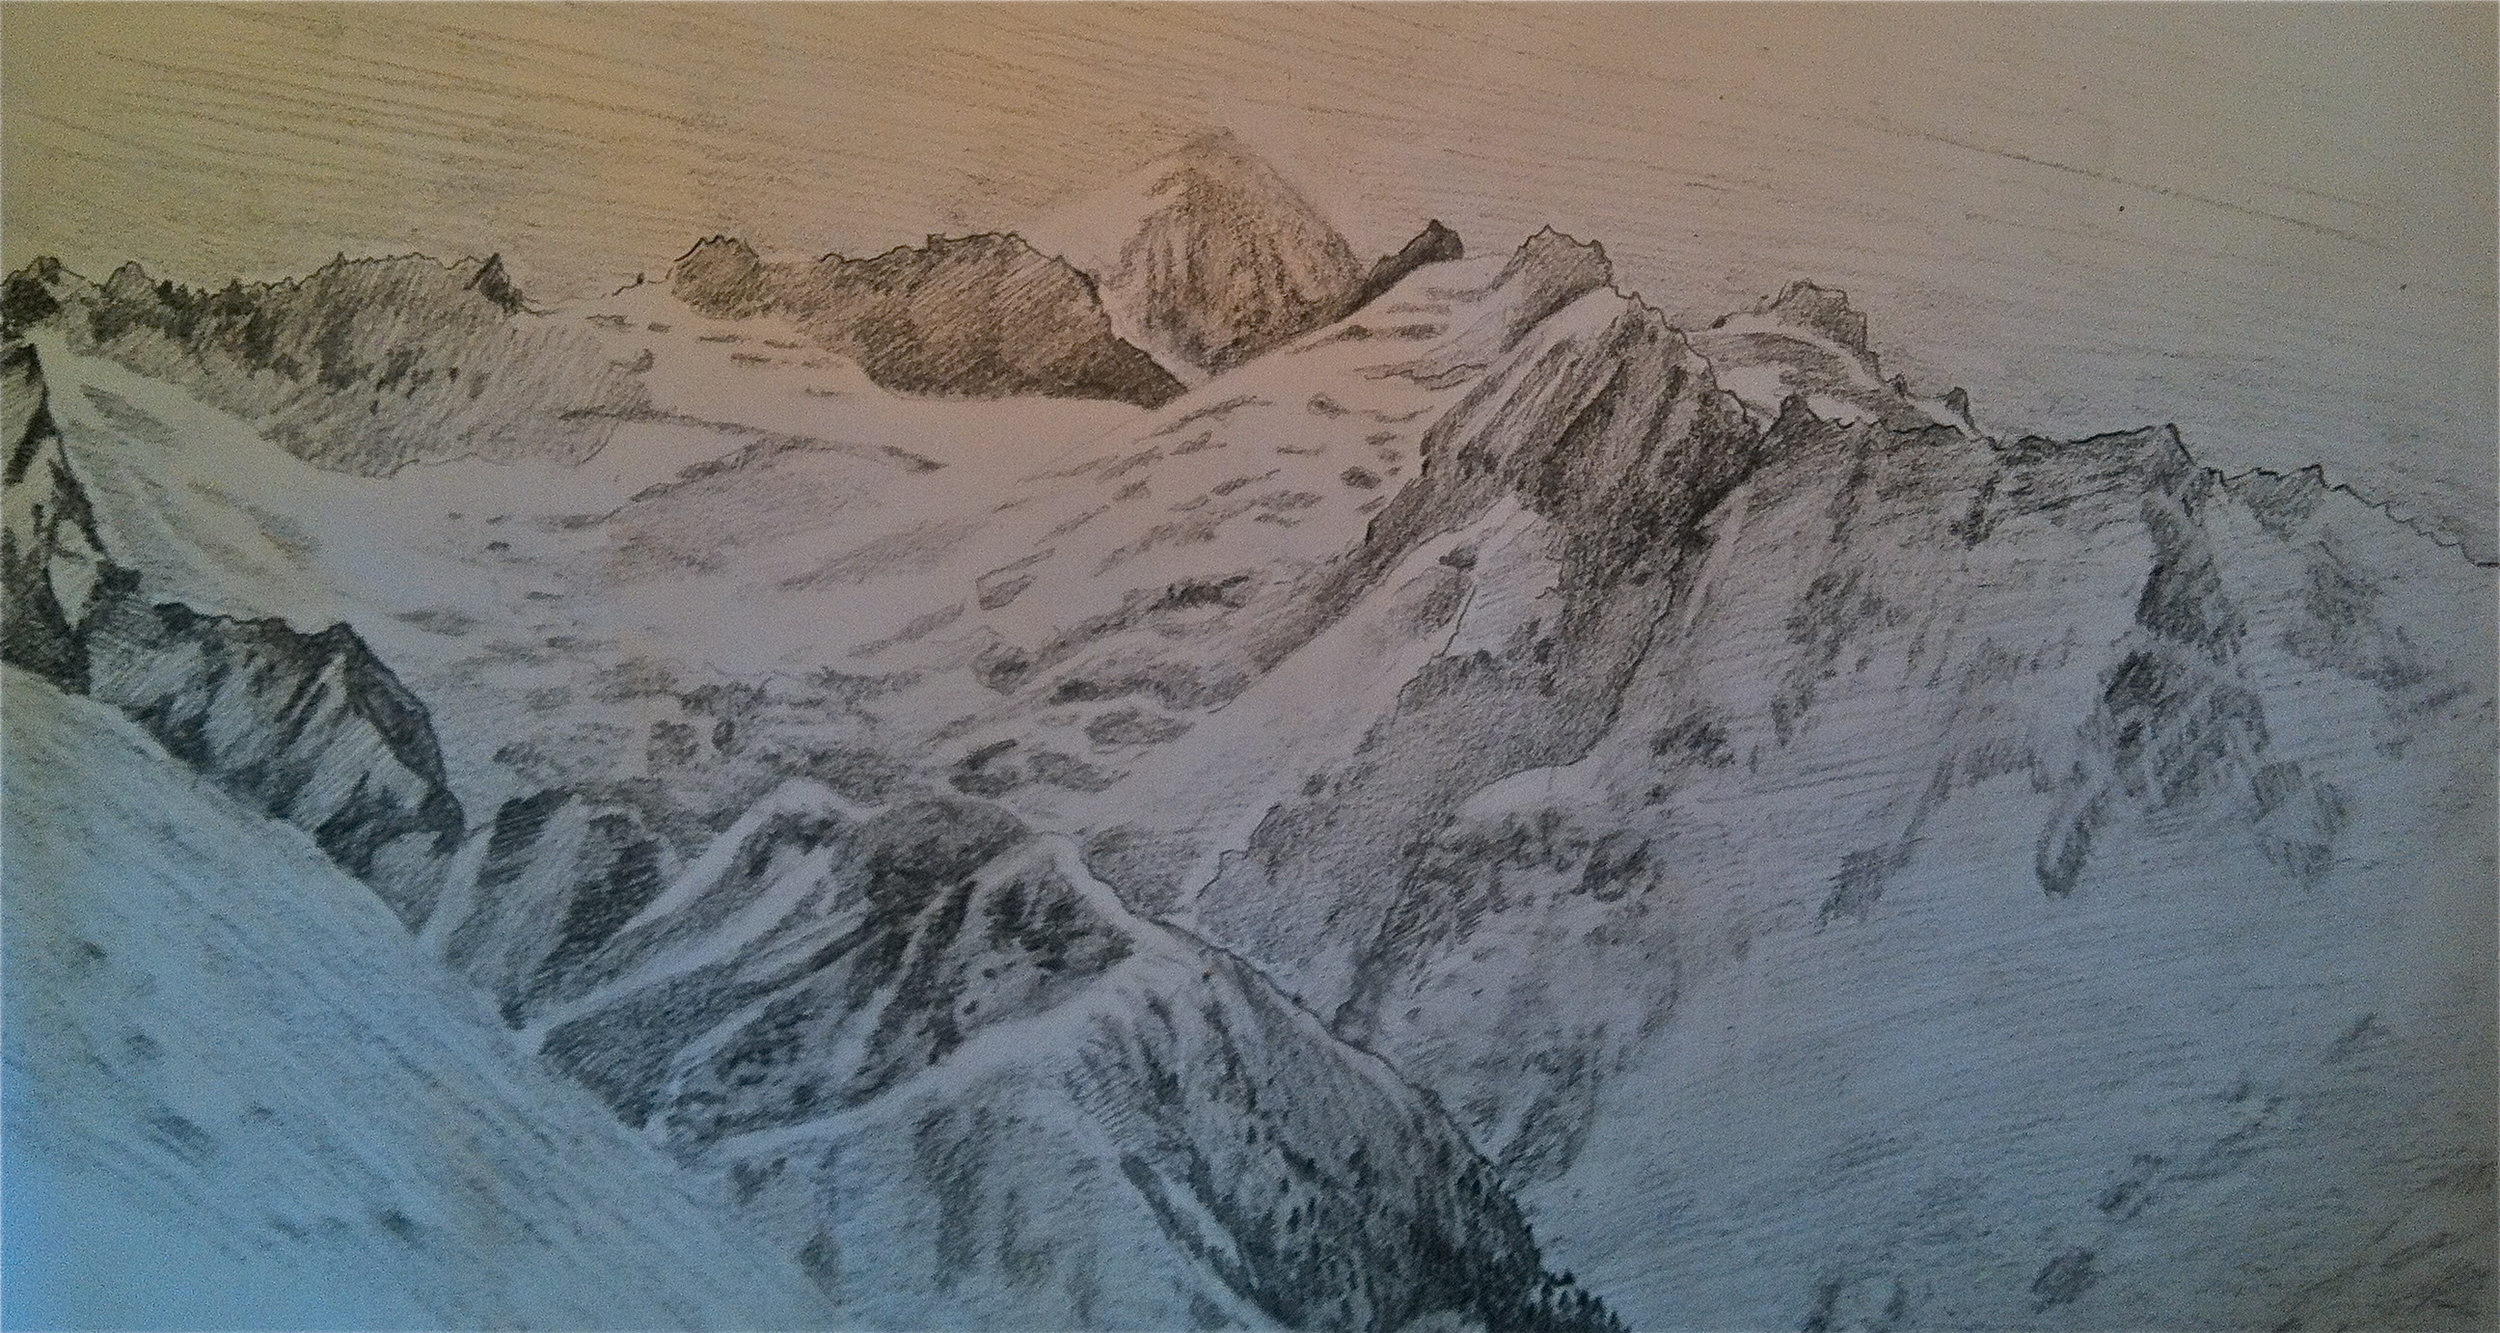 Eldorado and the McAllister Glacier from Isolation Peak